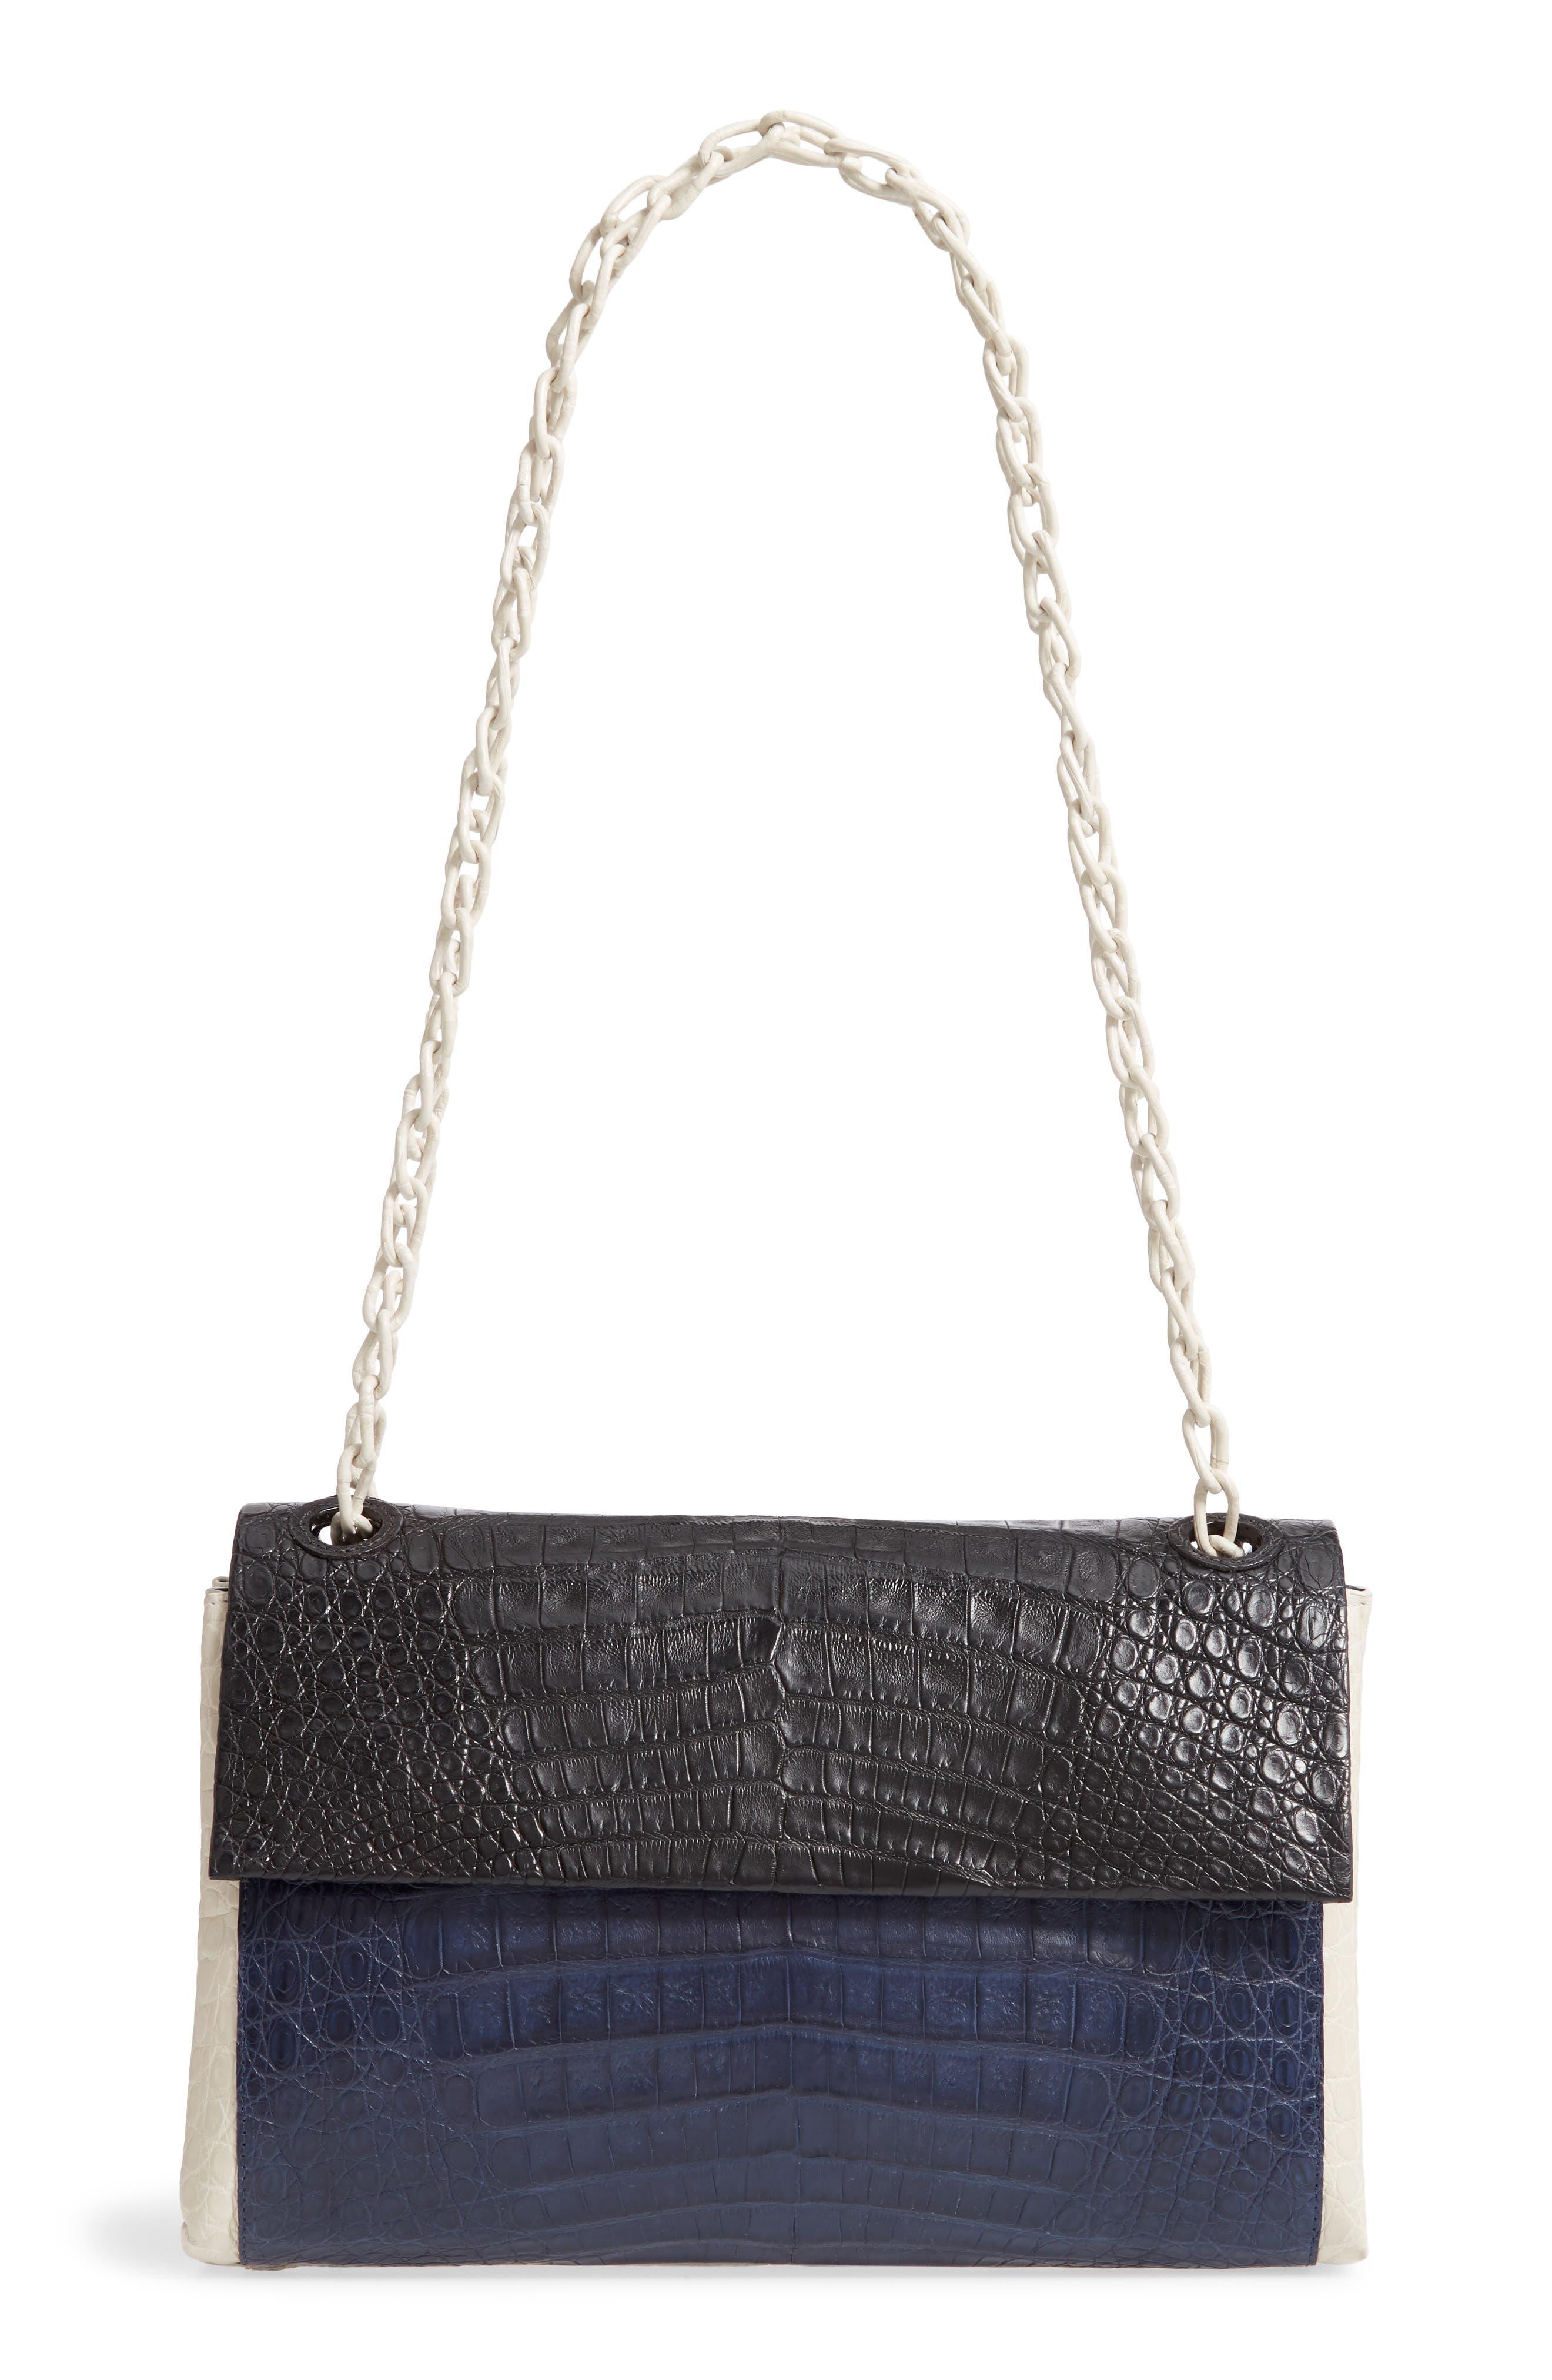 NANCY GONZALEZ, Medium Madison Genuine Crocodile Shoulder Bag, Main thumbnail 1, color, BLACK / NAVY/ LIGHT GREY